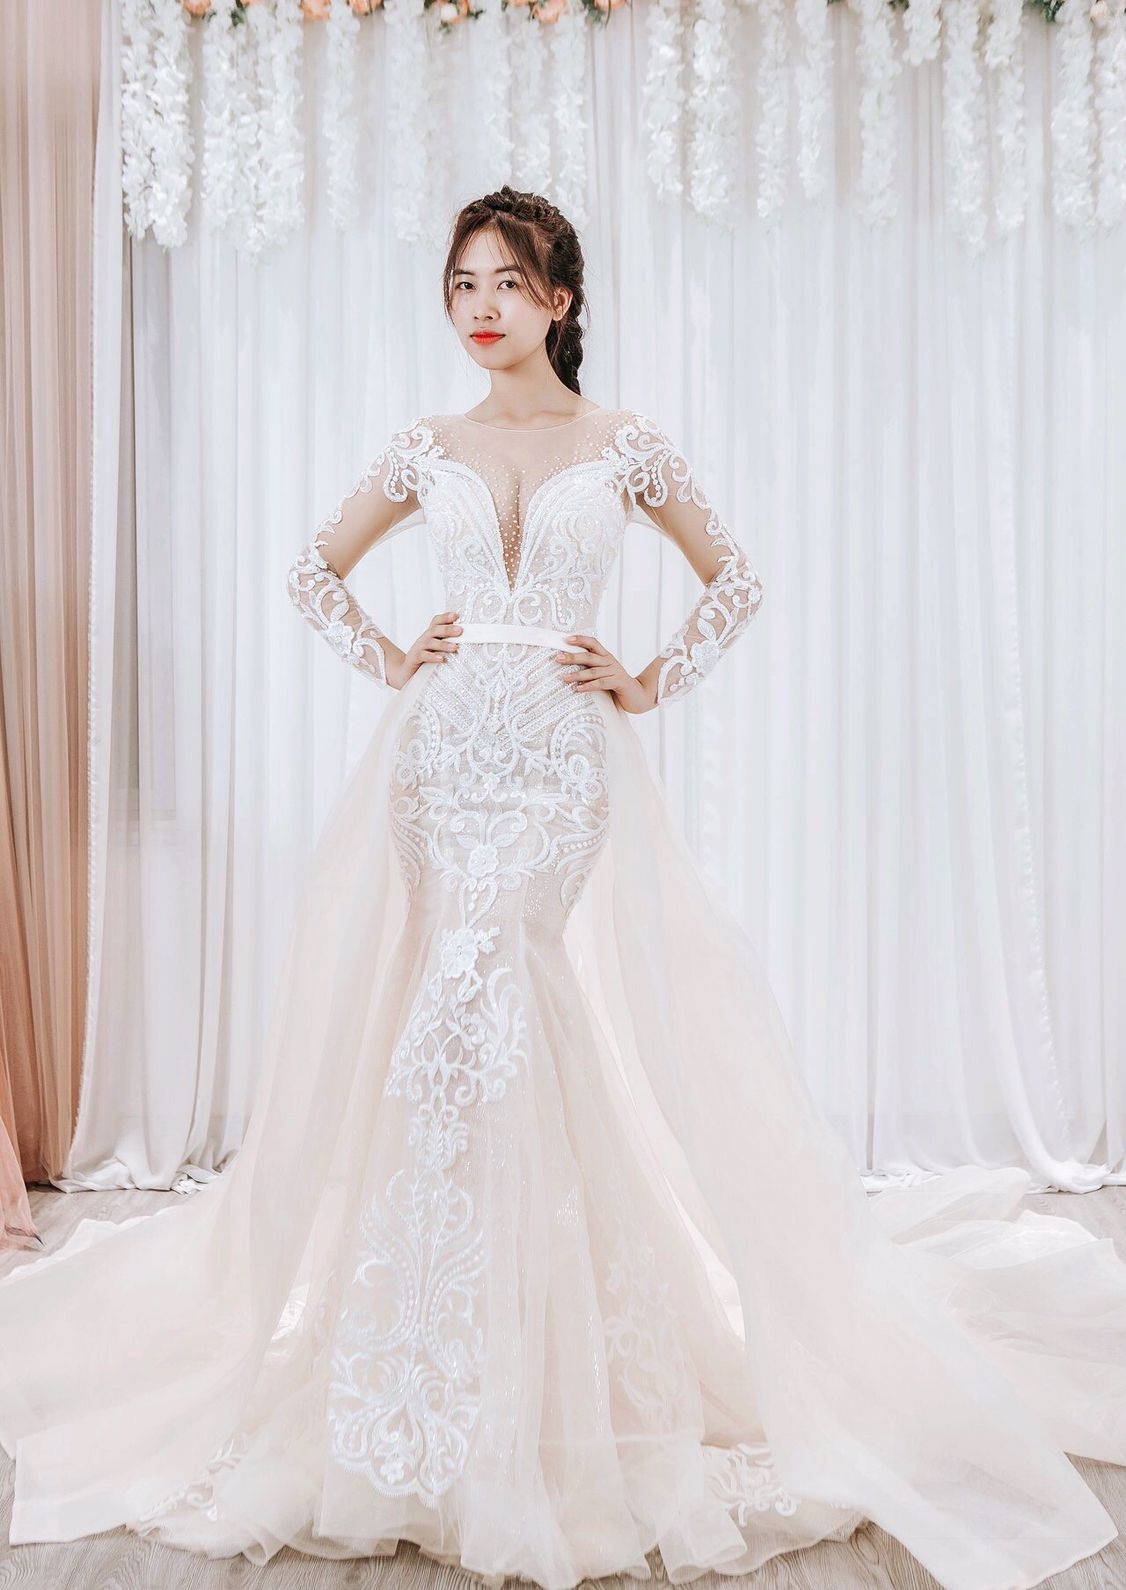 Detachable Skirt Wedding Dress/ Mermaid Bridal Gown